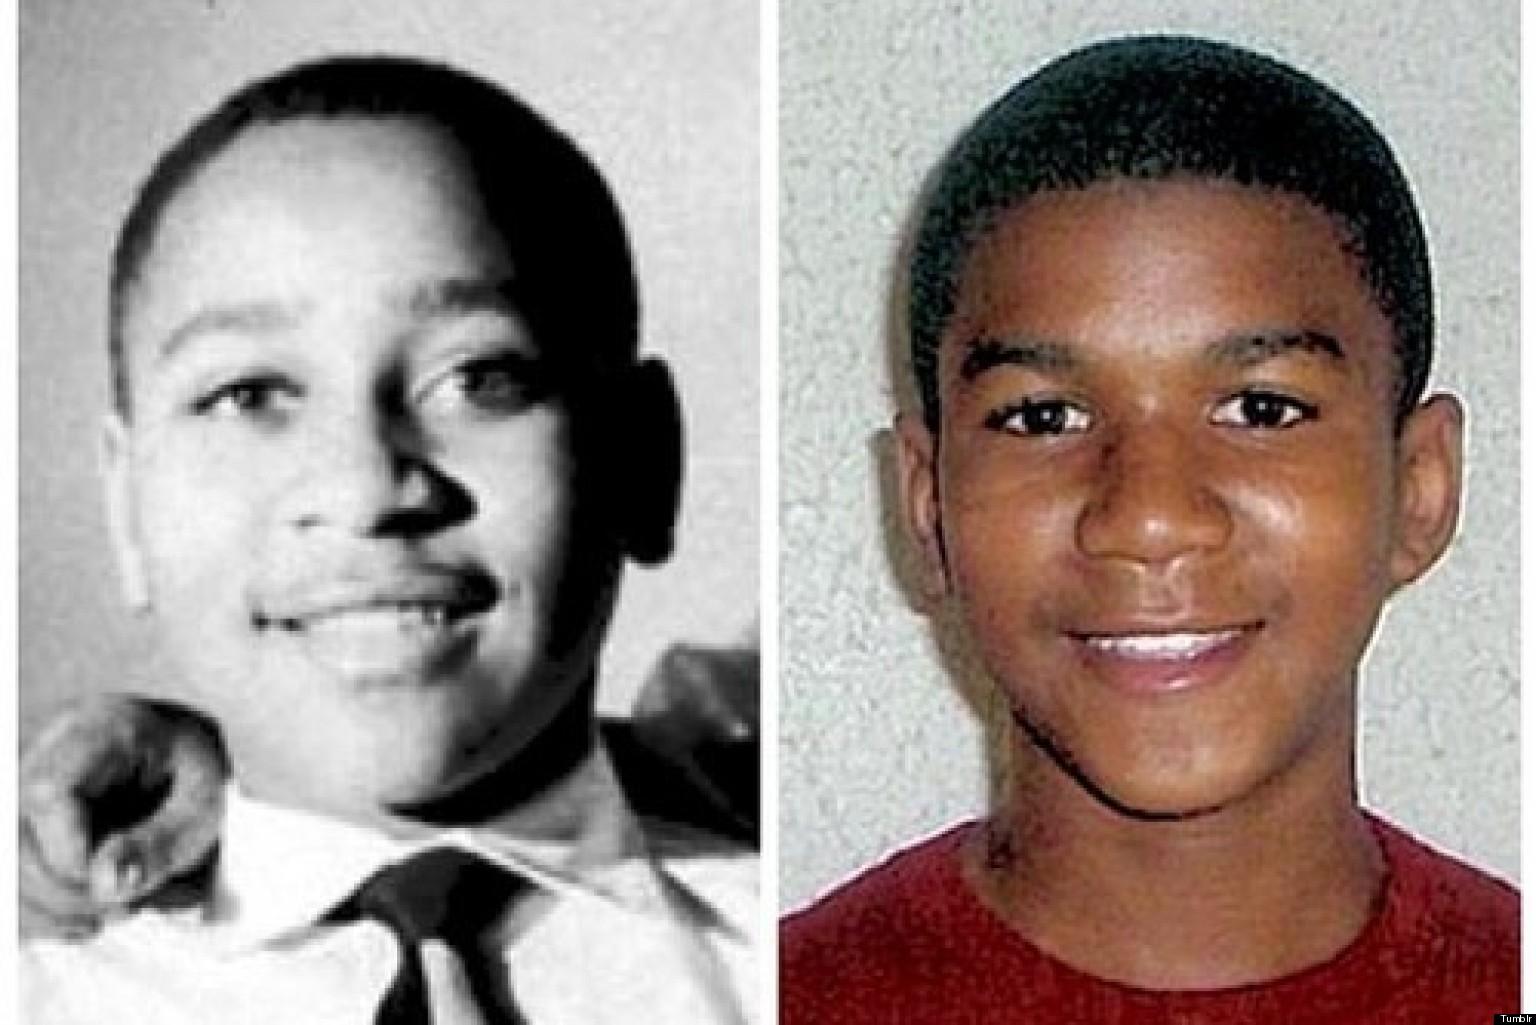 Trayvon martin body face down